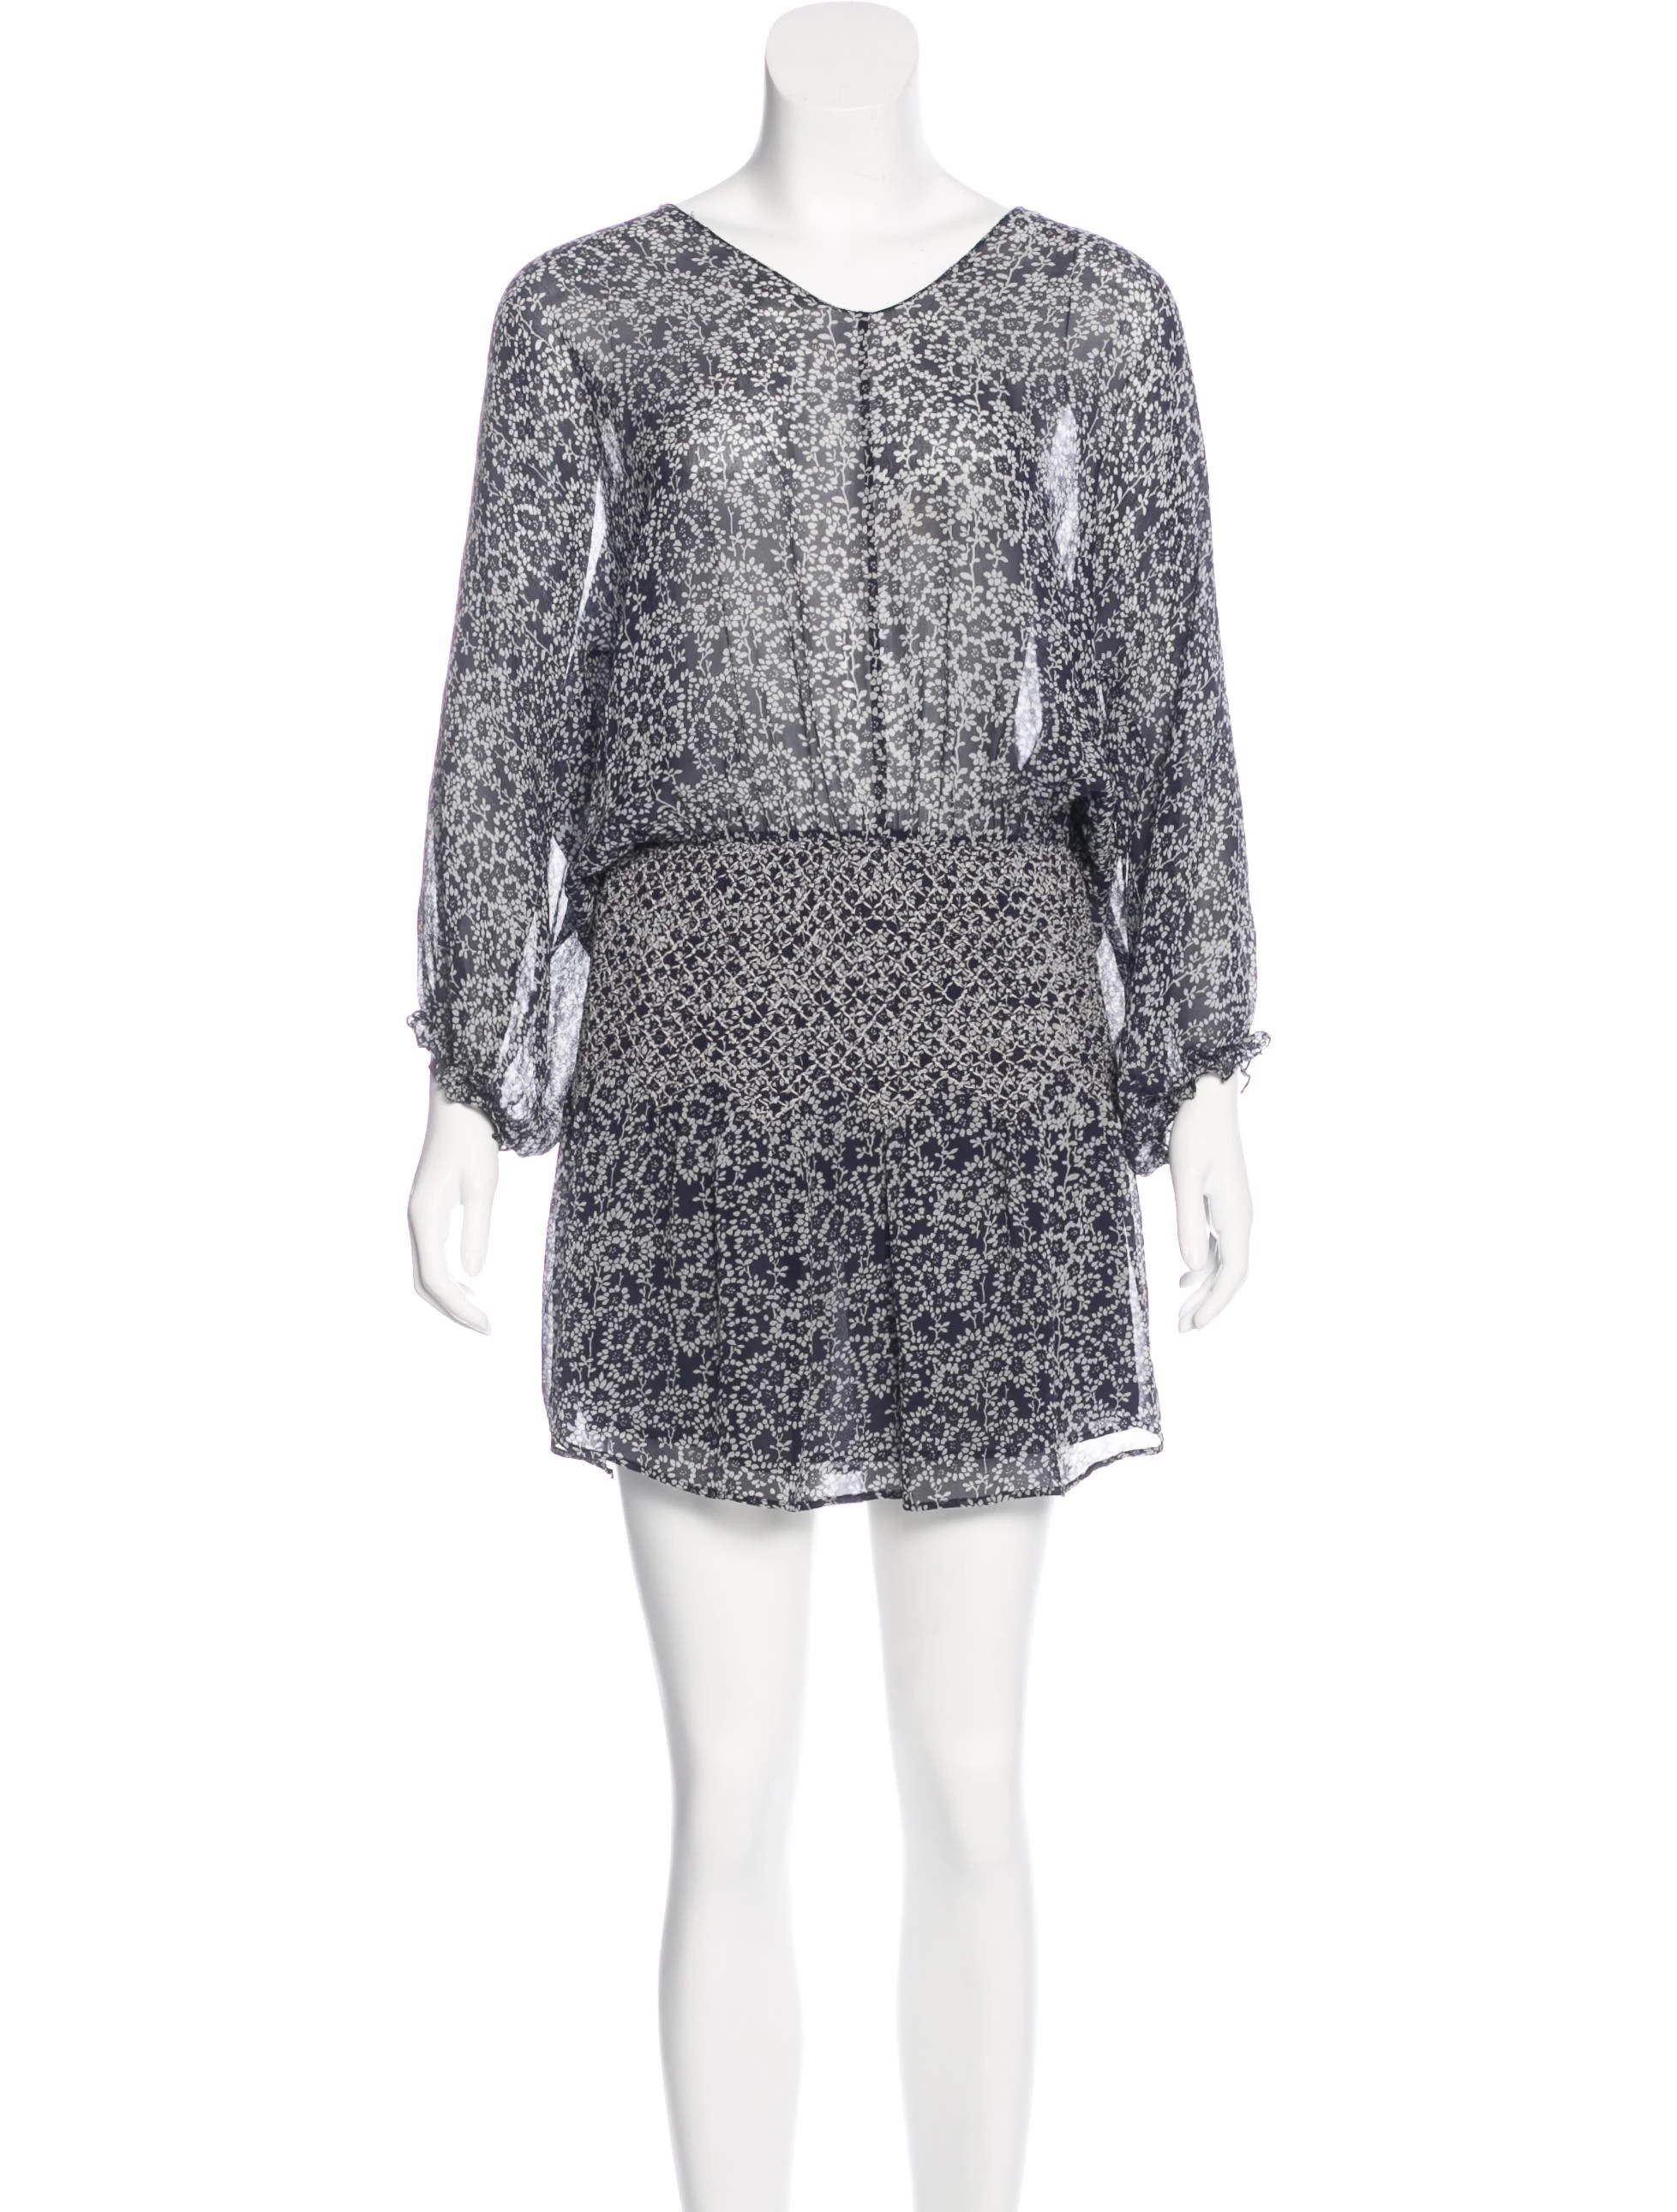 Ulla Johnson Silk Printed Dress Clothing WUL23641